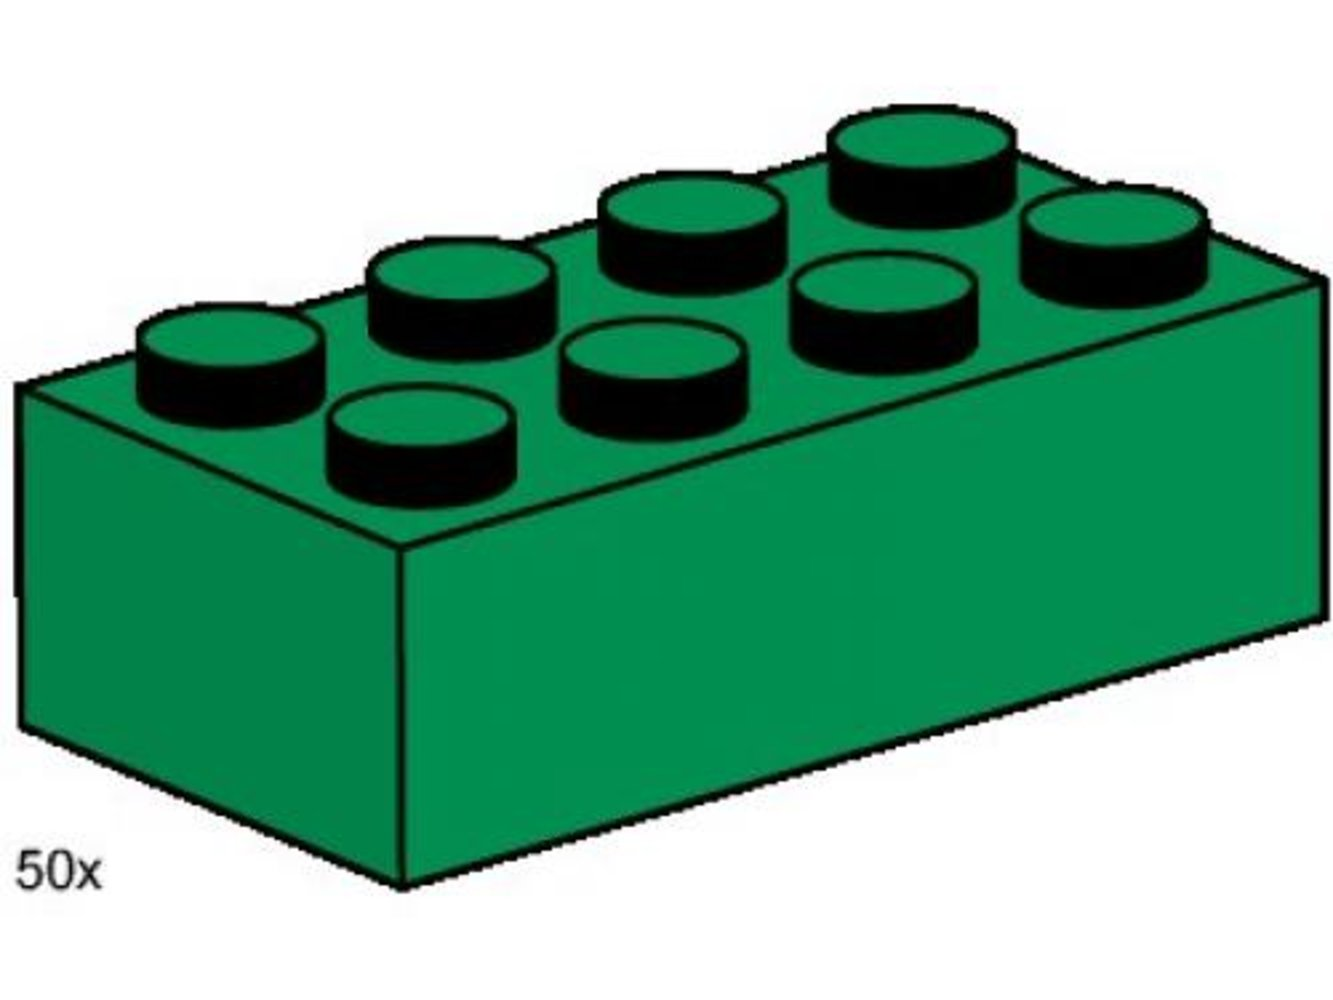 2 x 4 Dark Green Bricks